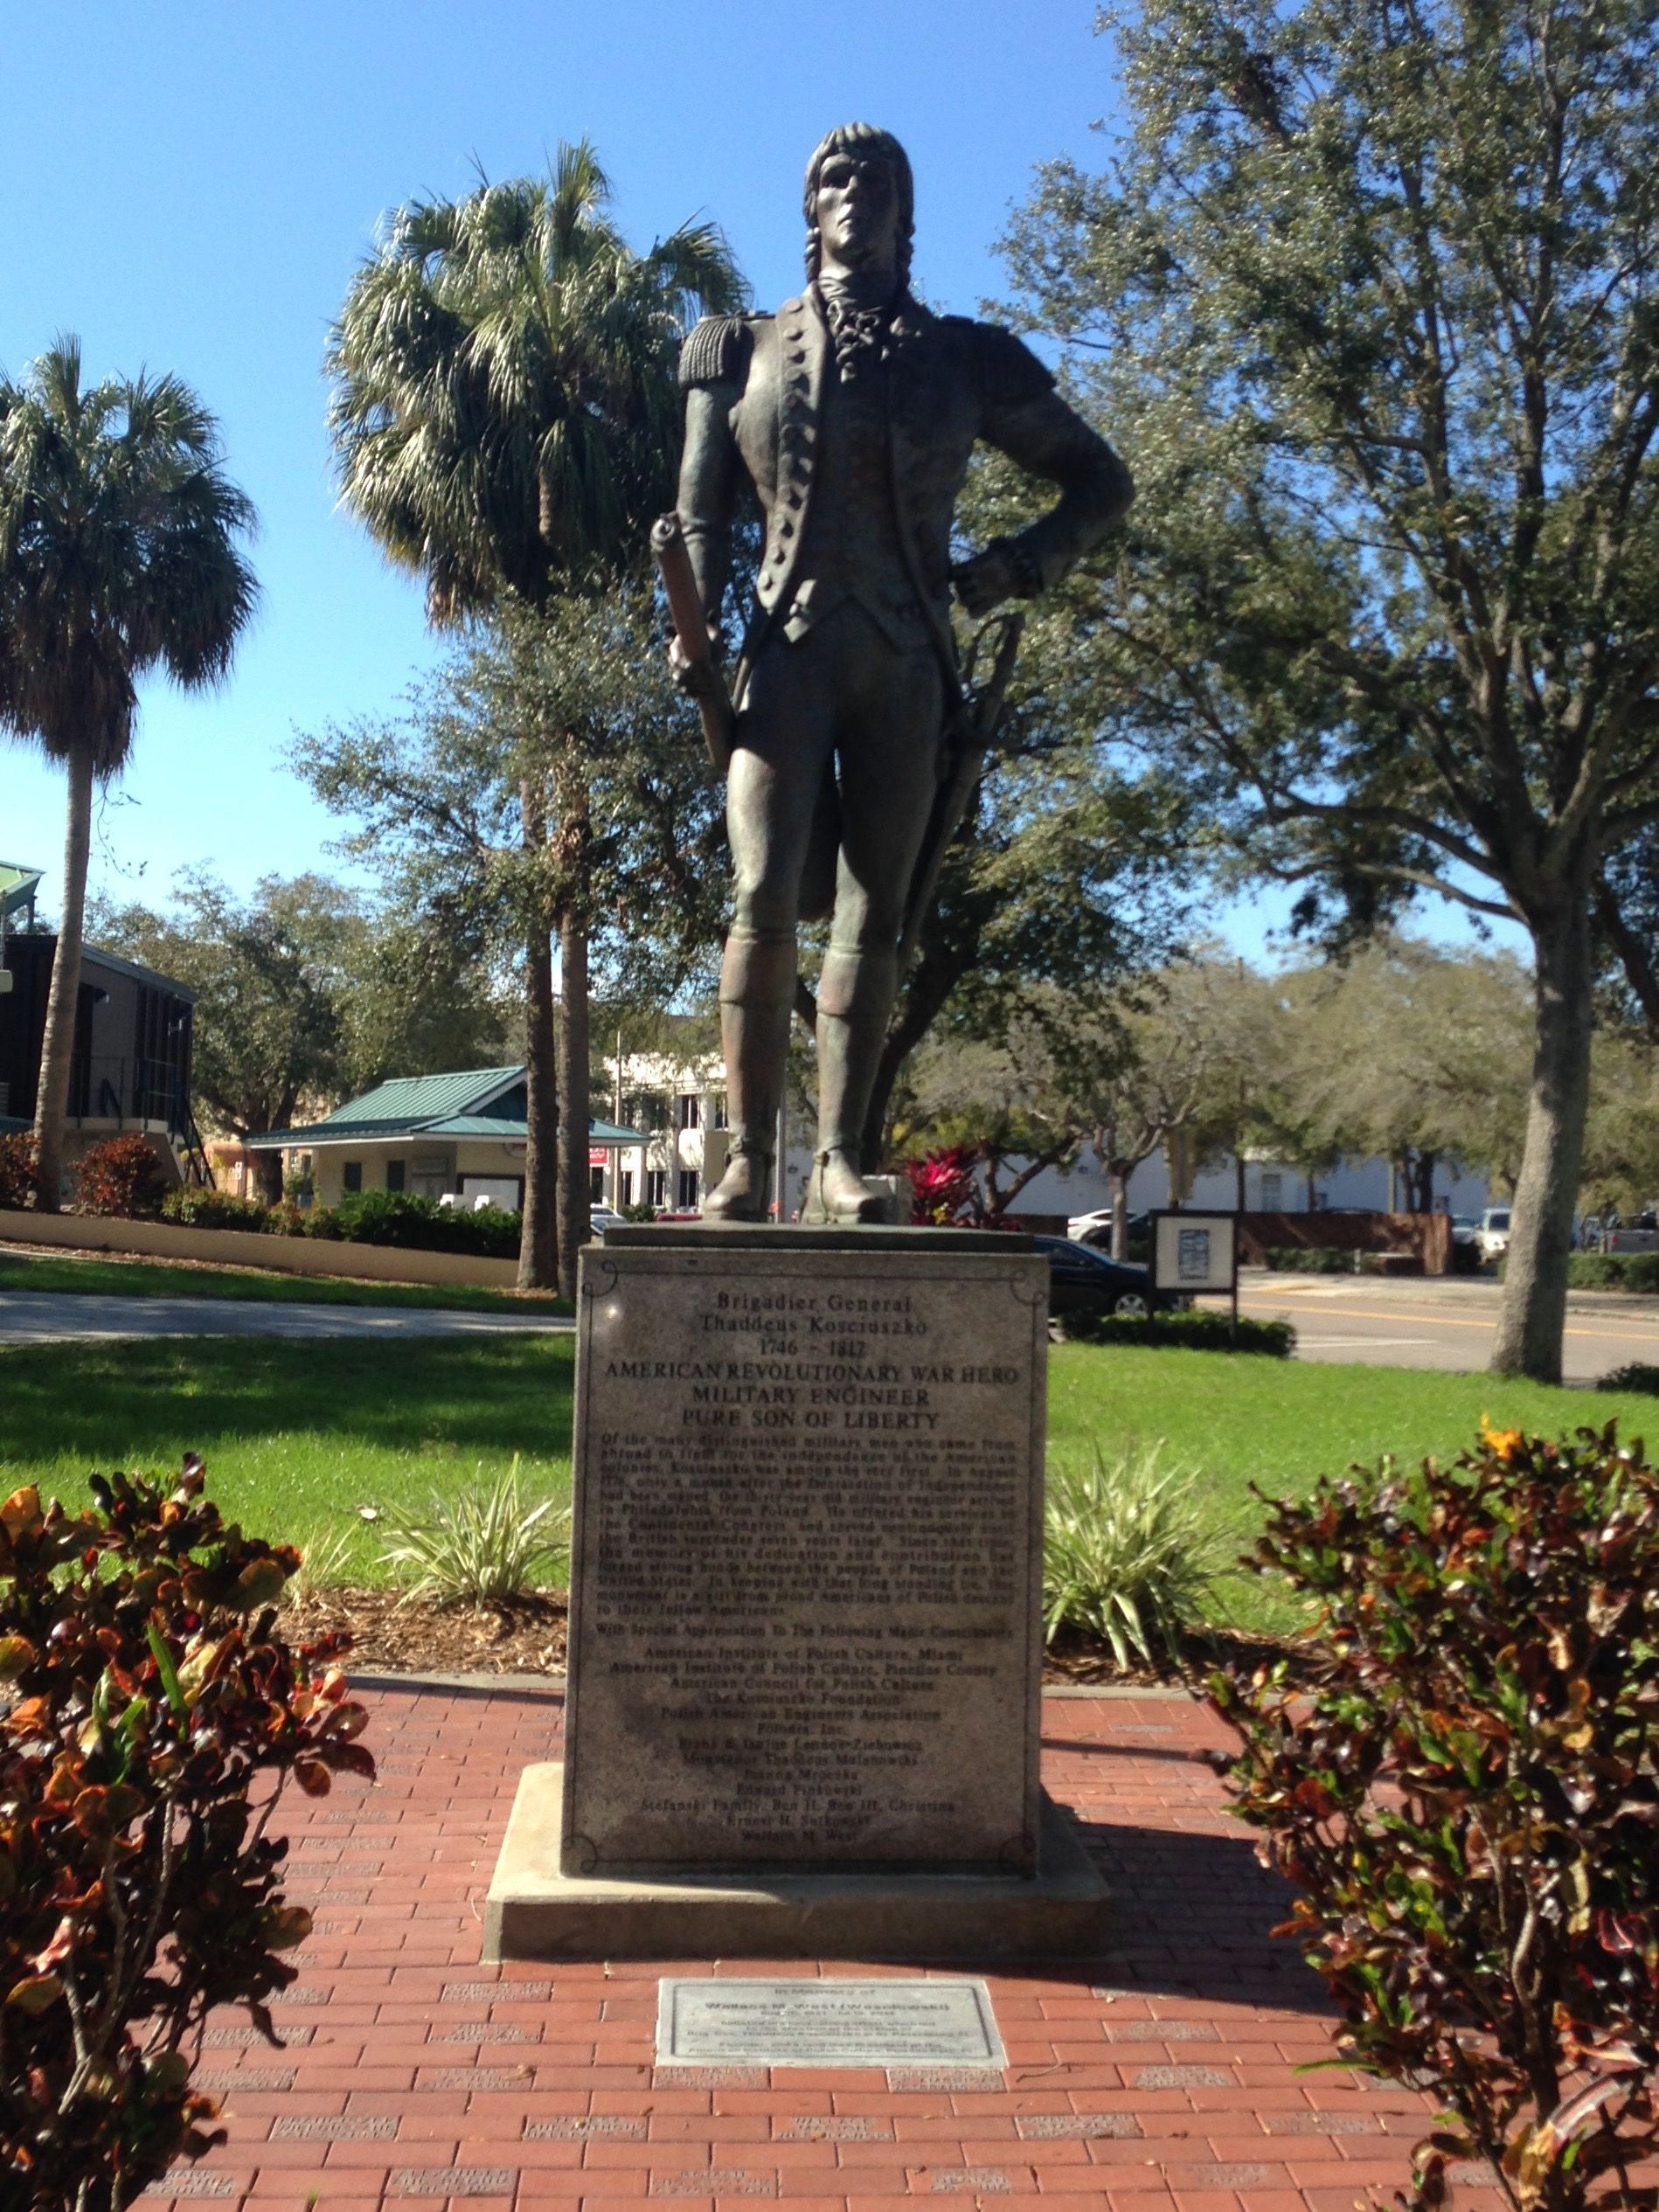 Thaddeus Kosciuszko Statue In Williams Park In Downtown St